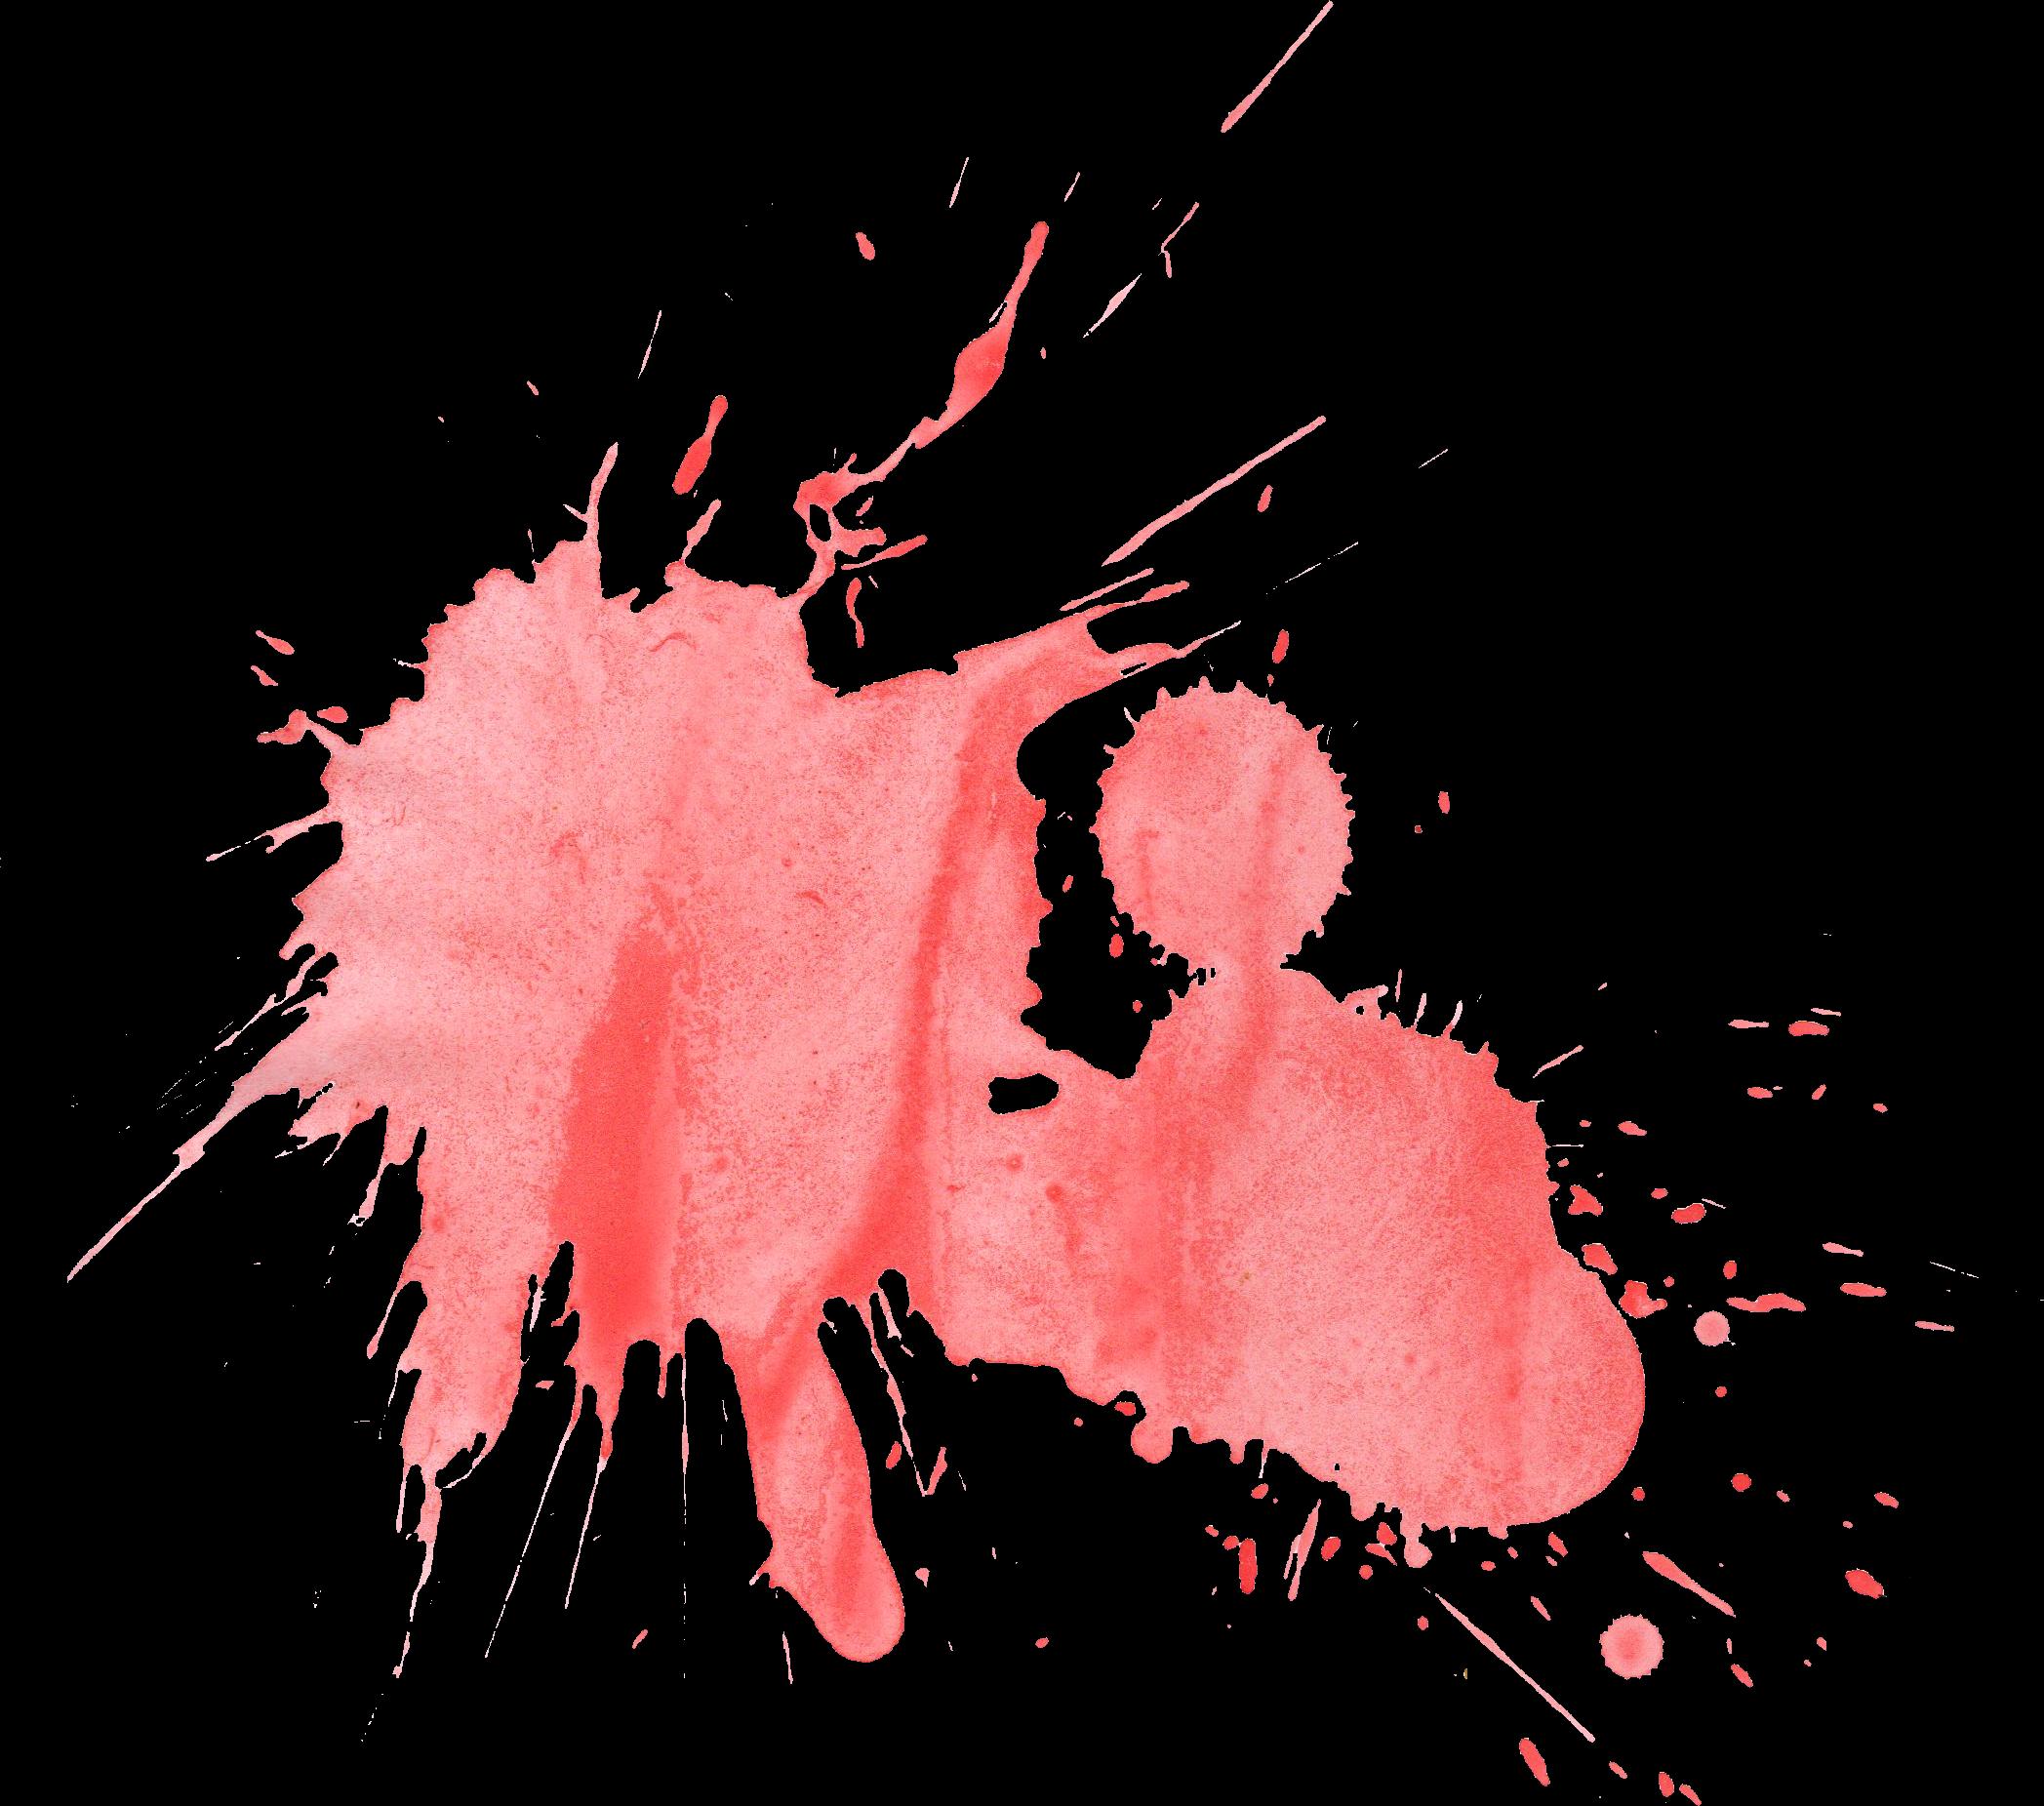 21 Red Watercolor Splatter (PNG Transparent) | OnlyGFX.com